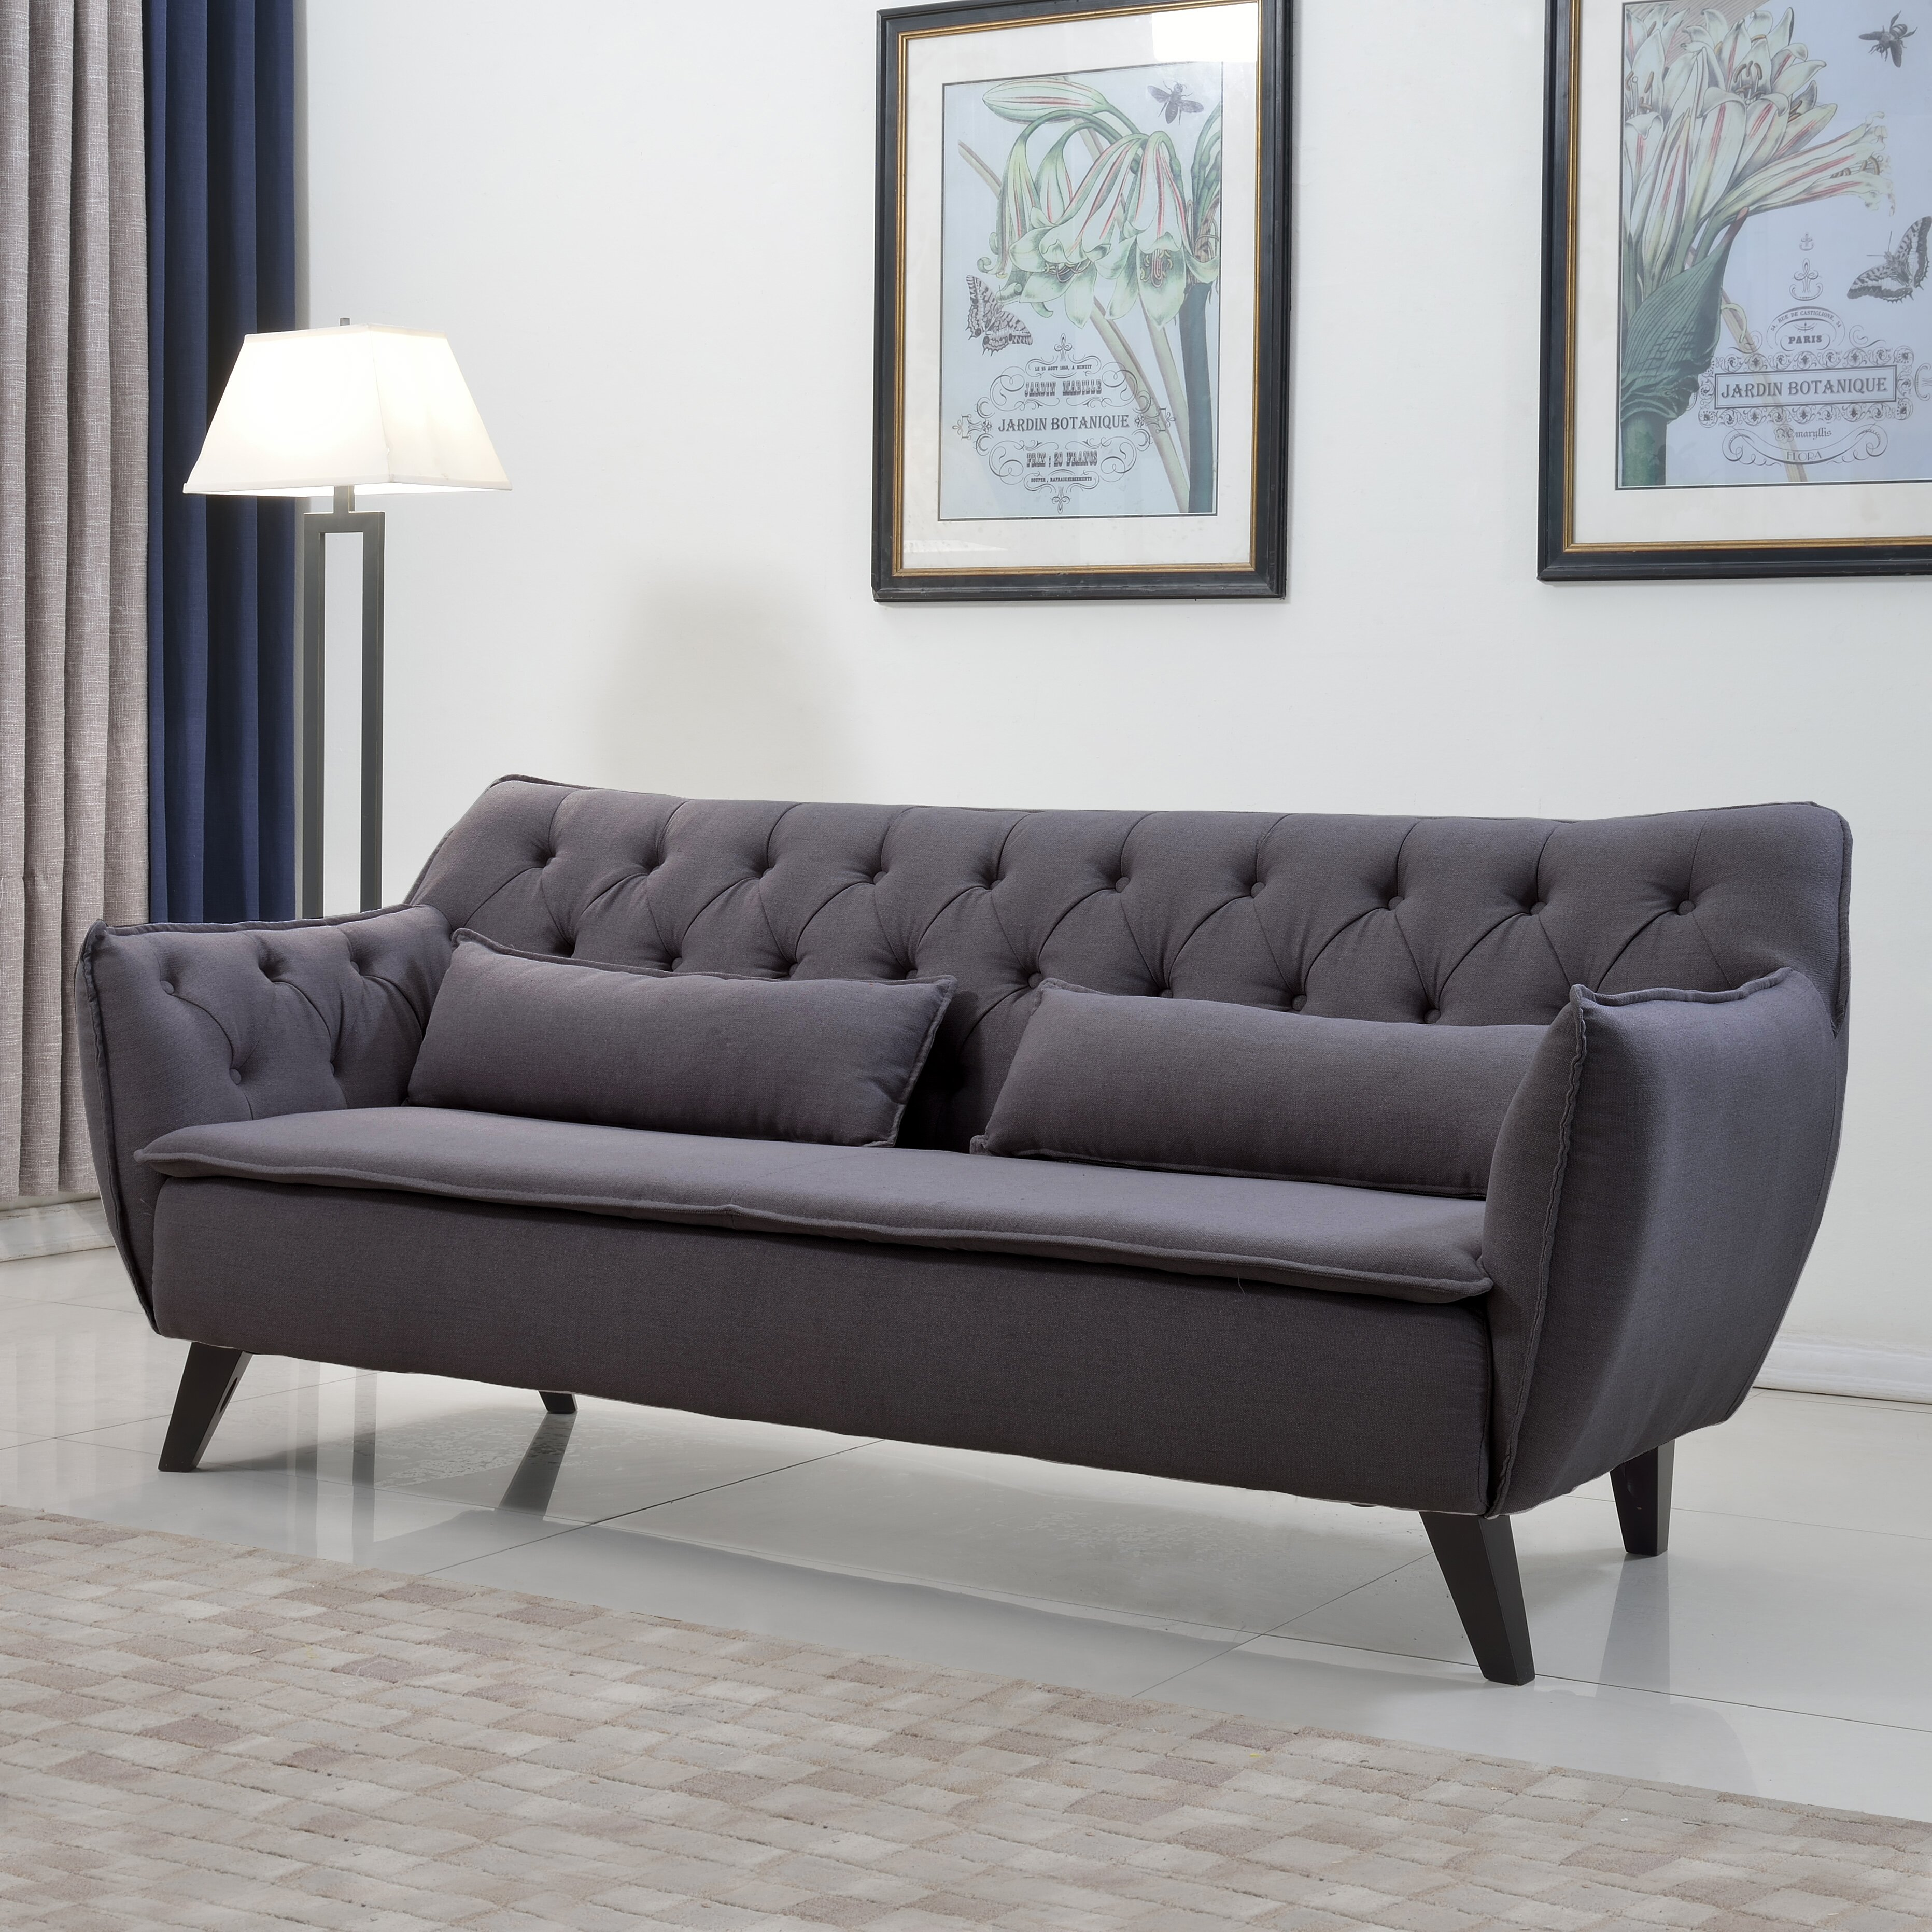 Round arm Sofas You'll Love   Wayfair